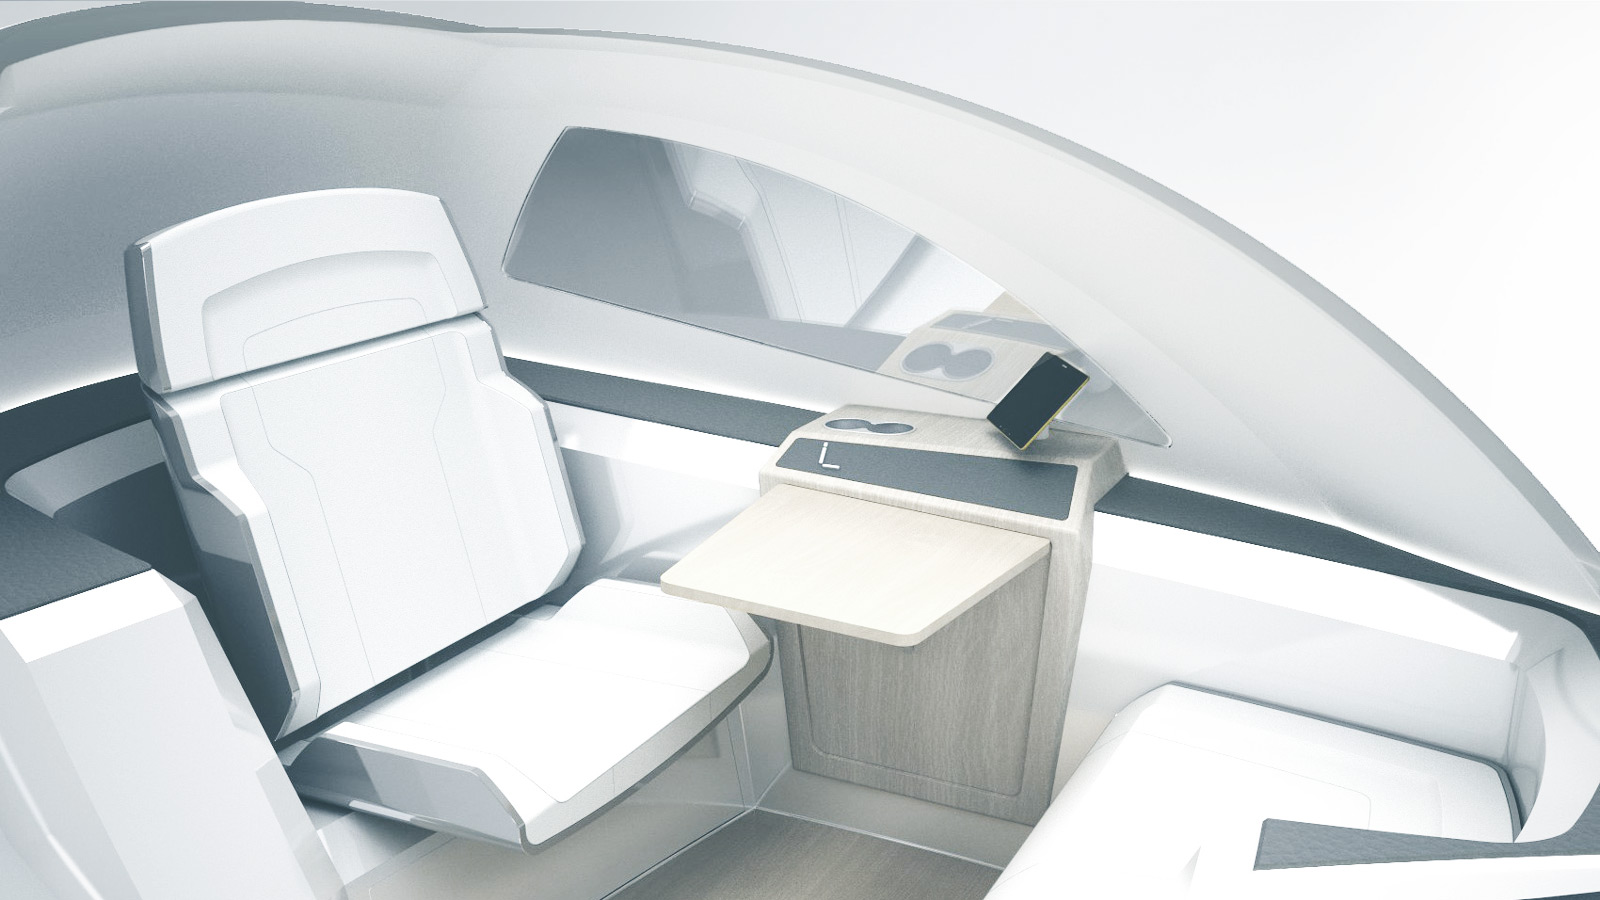 Airpod sleep capsule